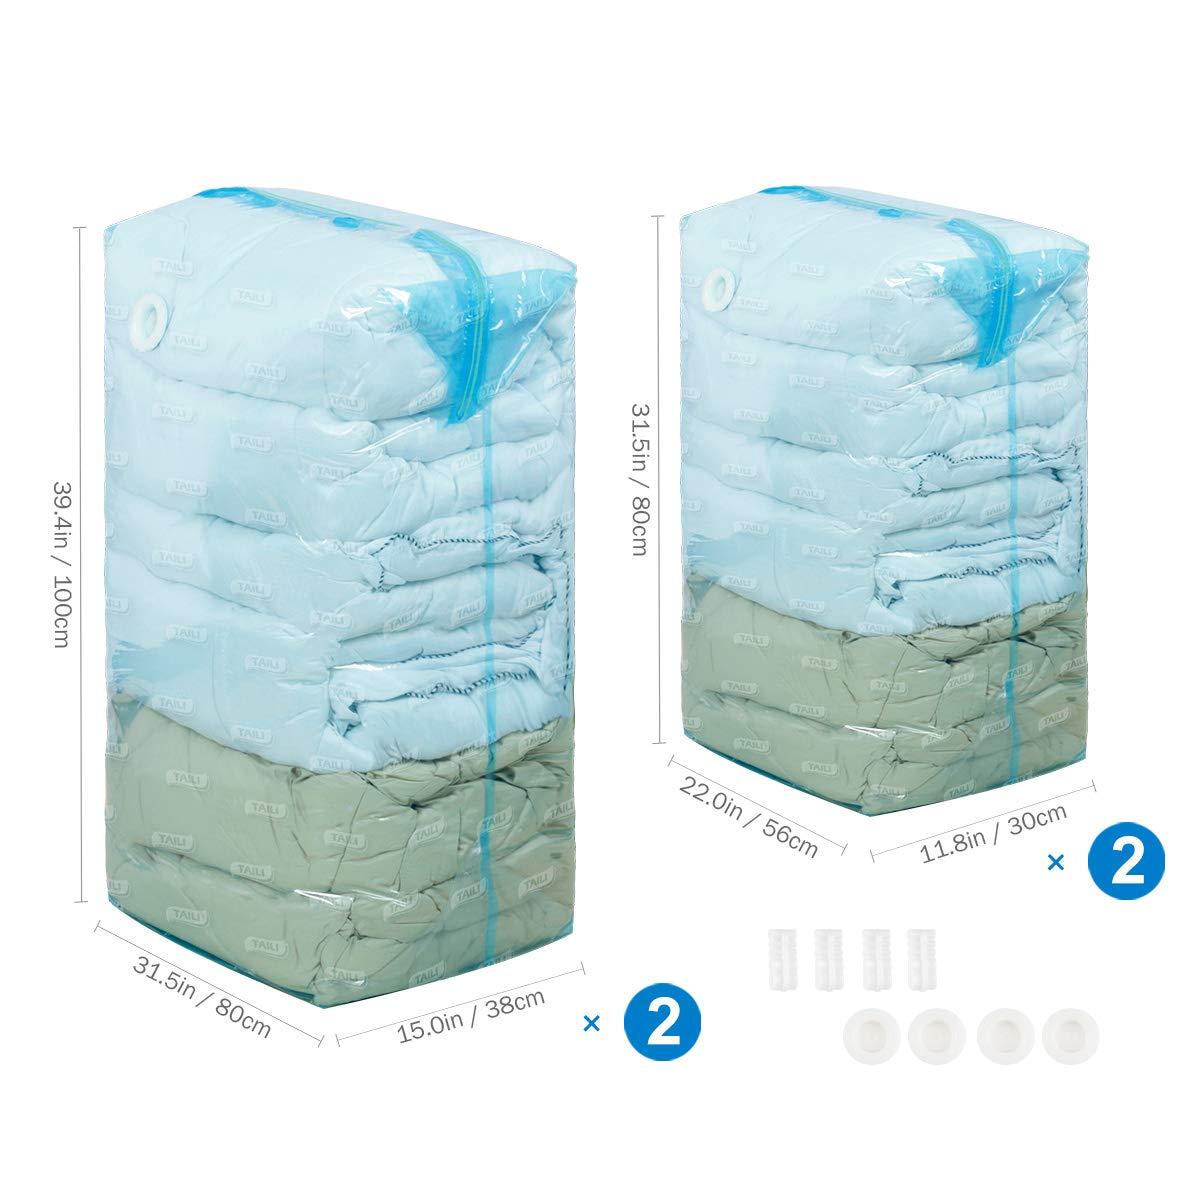 ... Bolsas ahorradoras de espacio 4 Piezas, 2 x (80 x 100 x 38 cm)&2 x (56x80x38cm) (Funciona con cualquier aspiradora) para almohadas edredón Manta Ropa ...